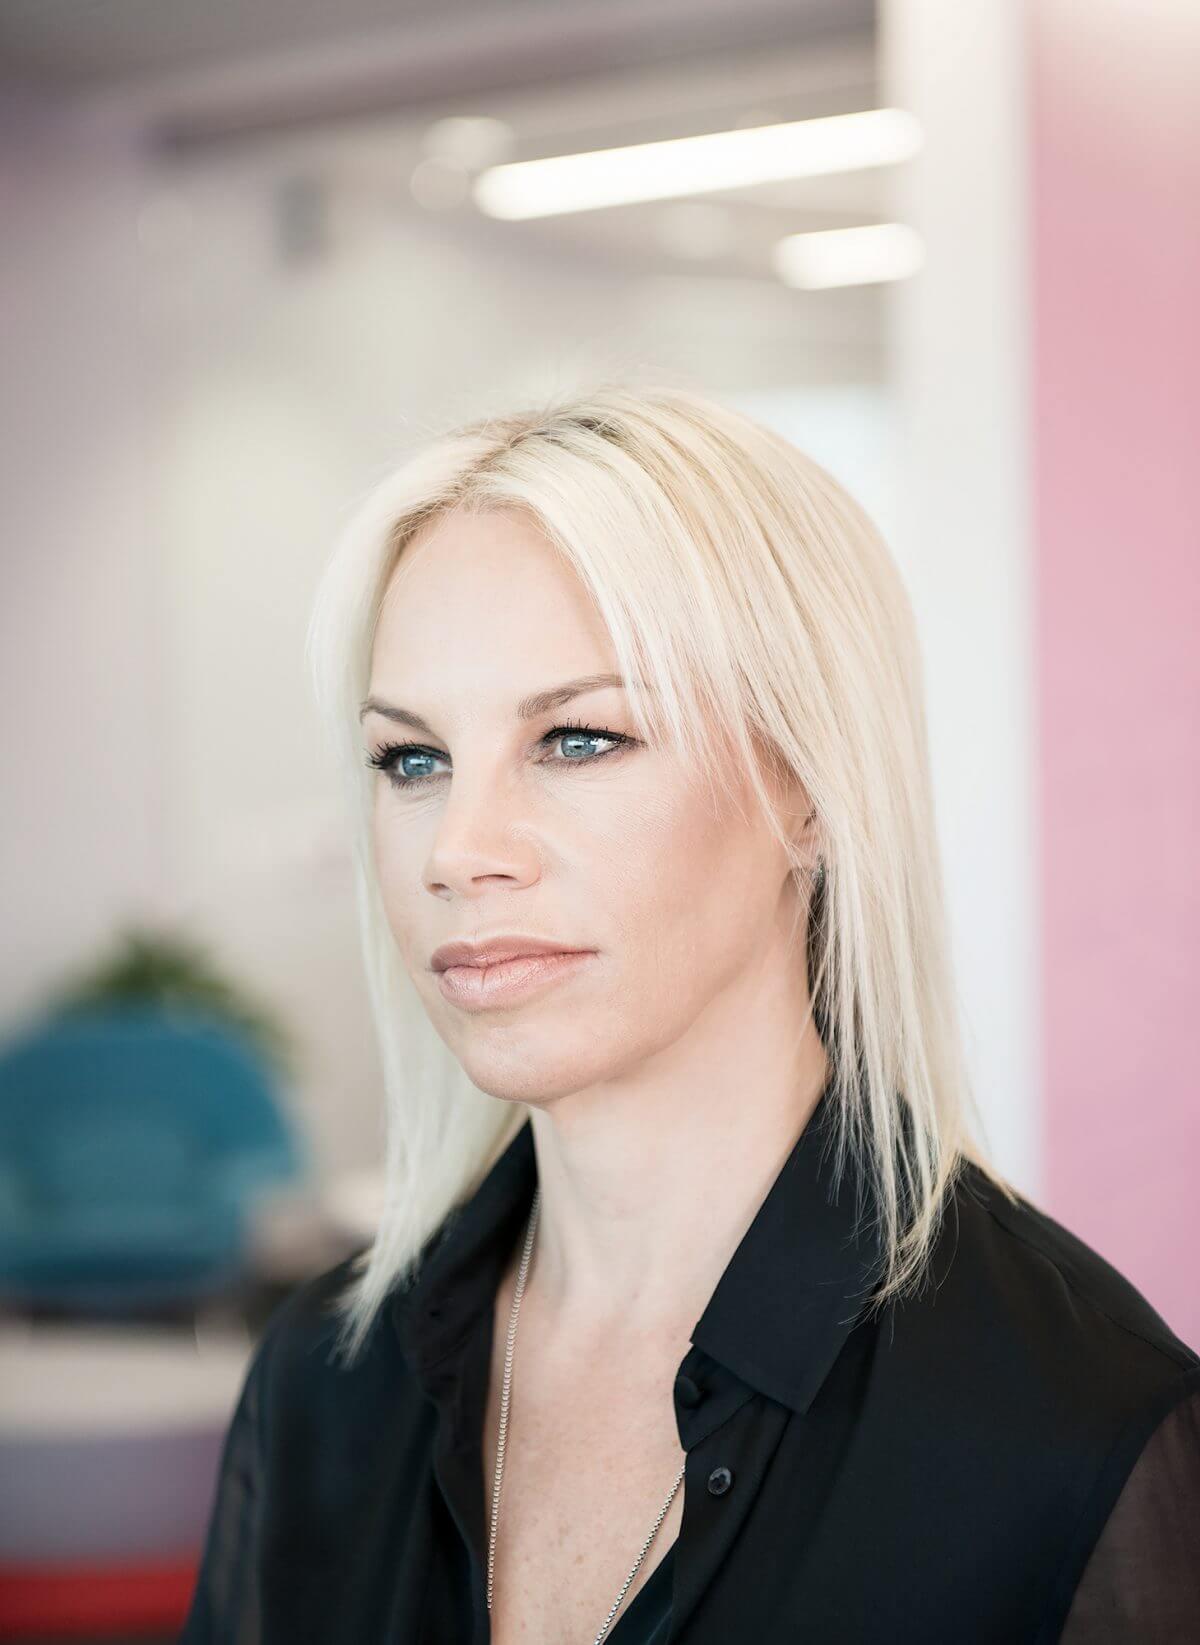 Melinda Richter, head of Johnson & Johnson Innovation Labs